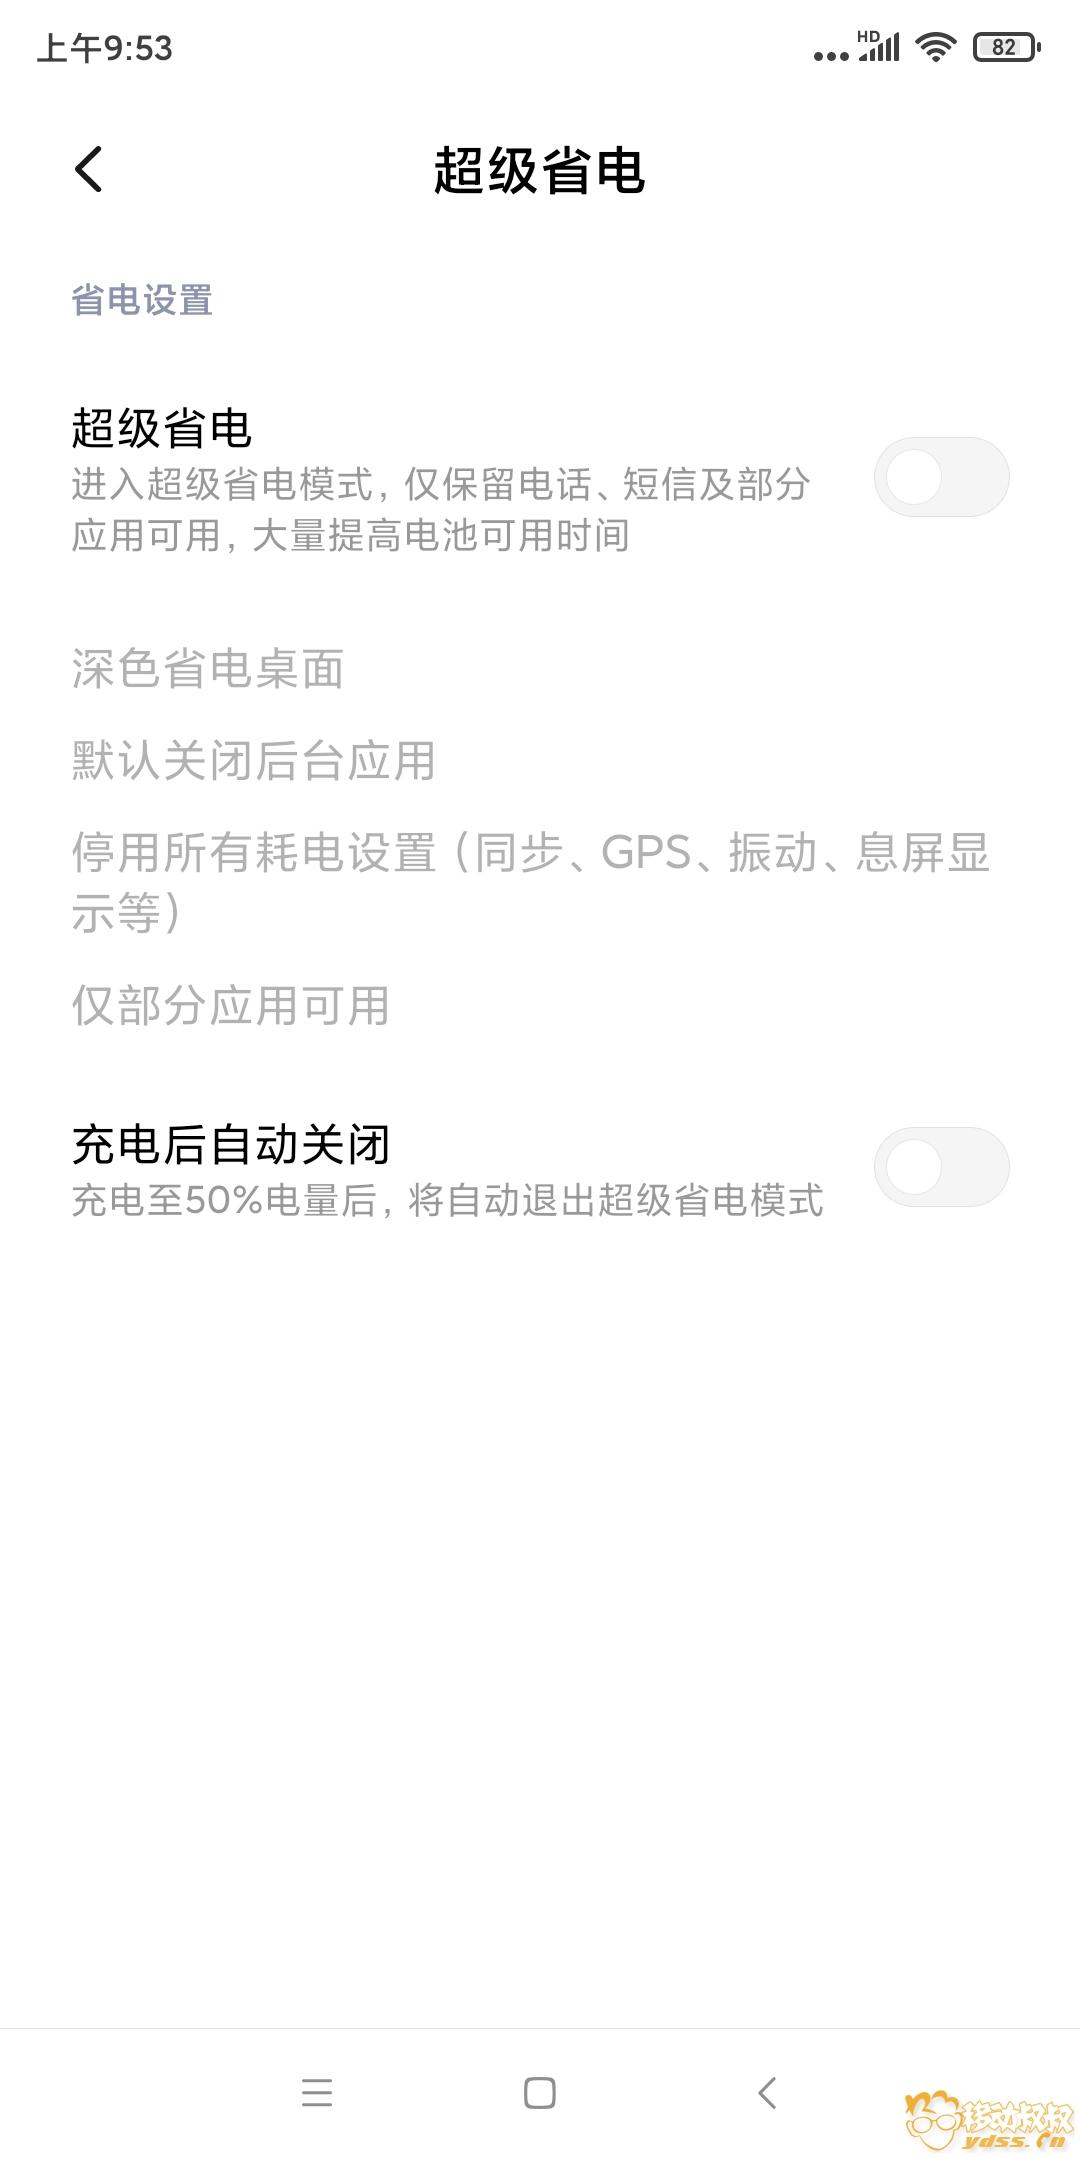 Screenshot_2019-11-06-09-53-40-537_com.miui.securitycenter.jpg